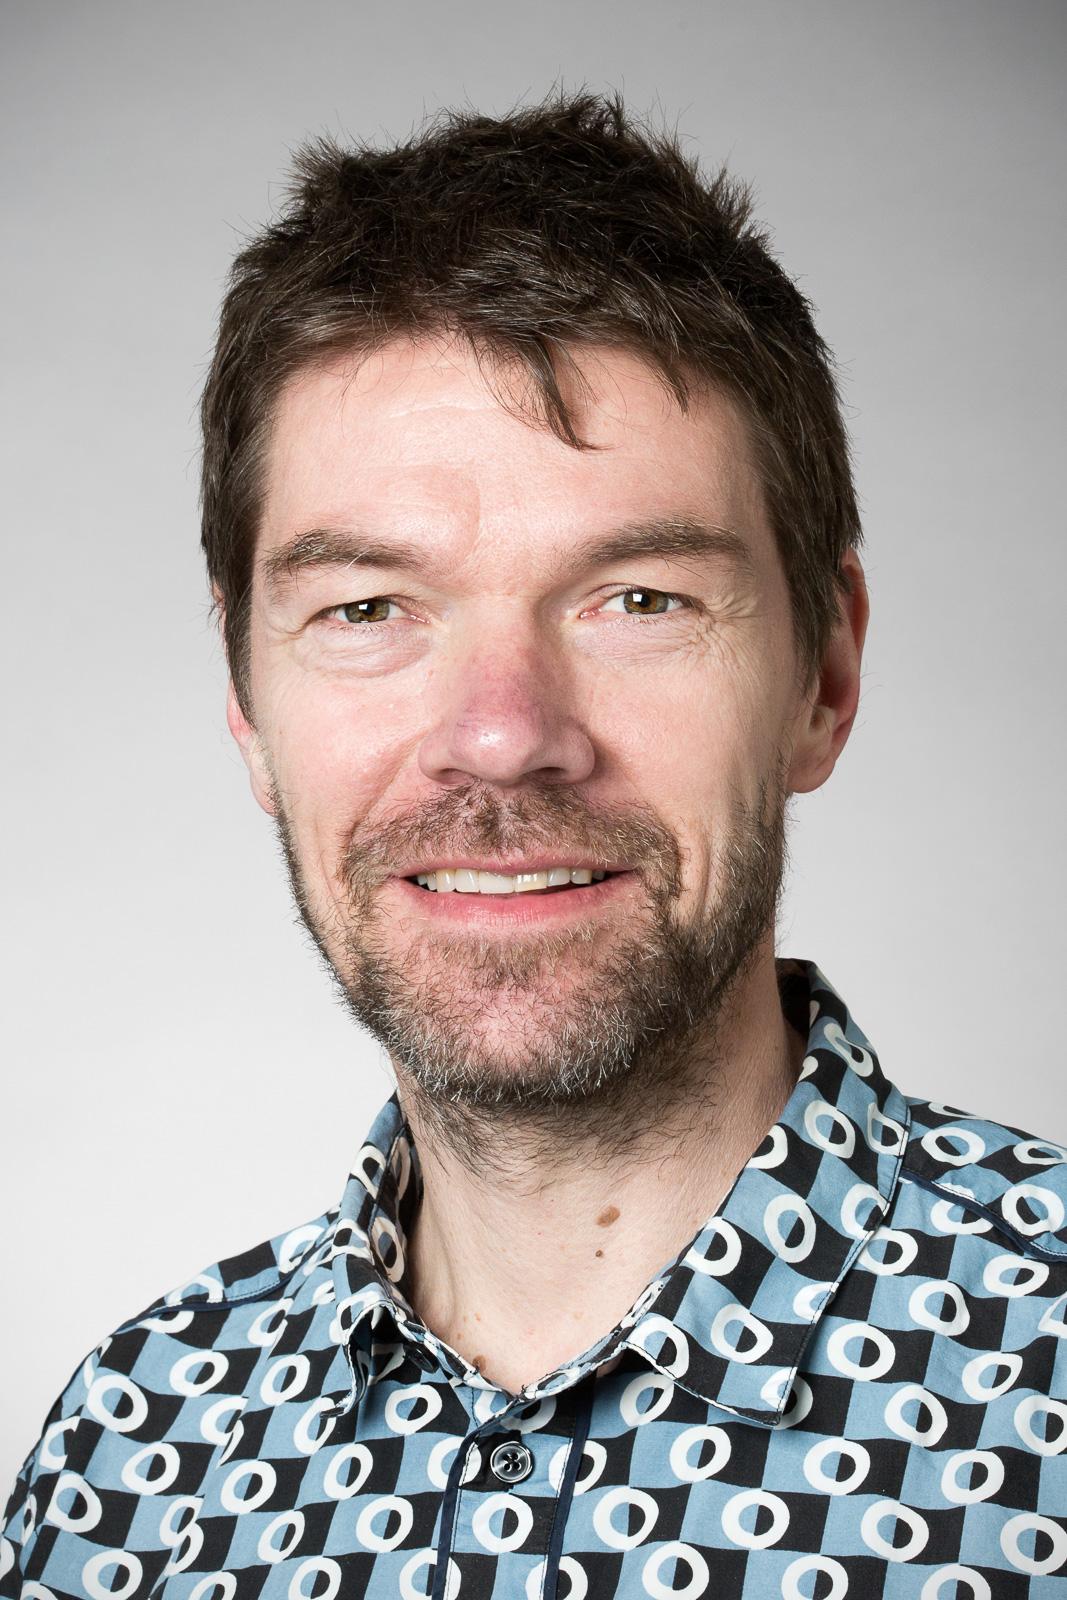 Søren Bro Pold